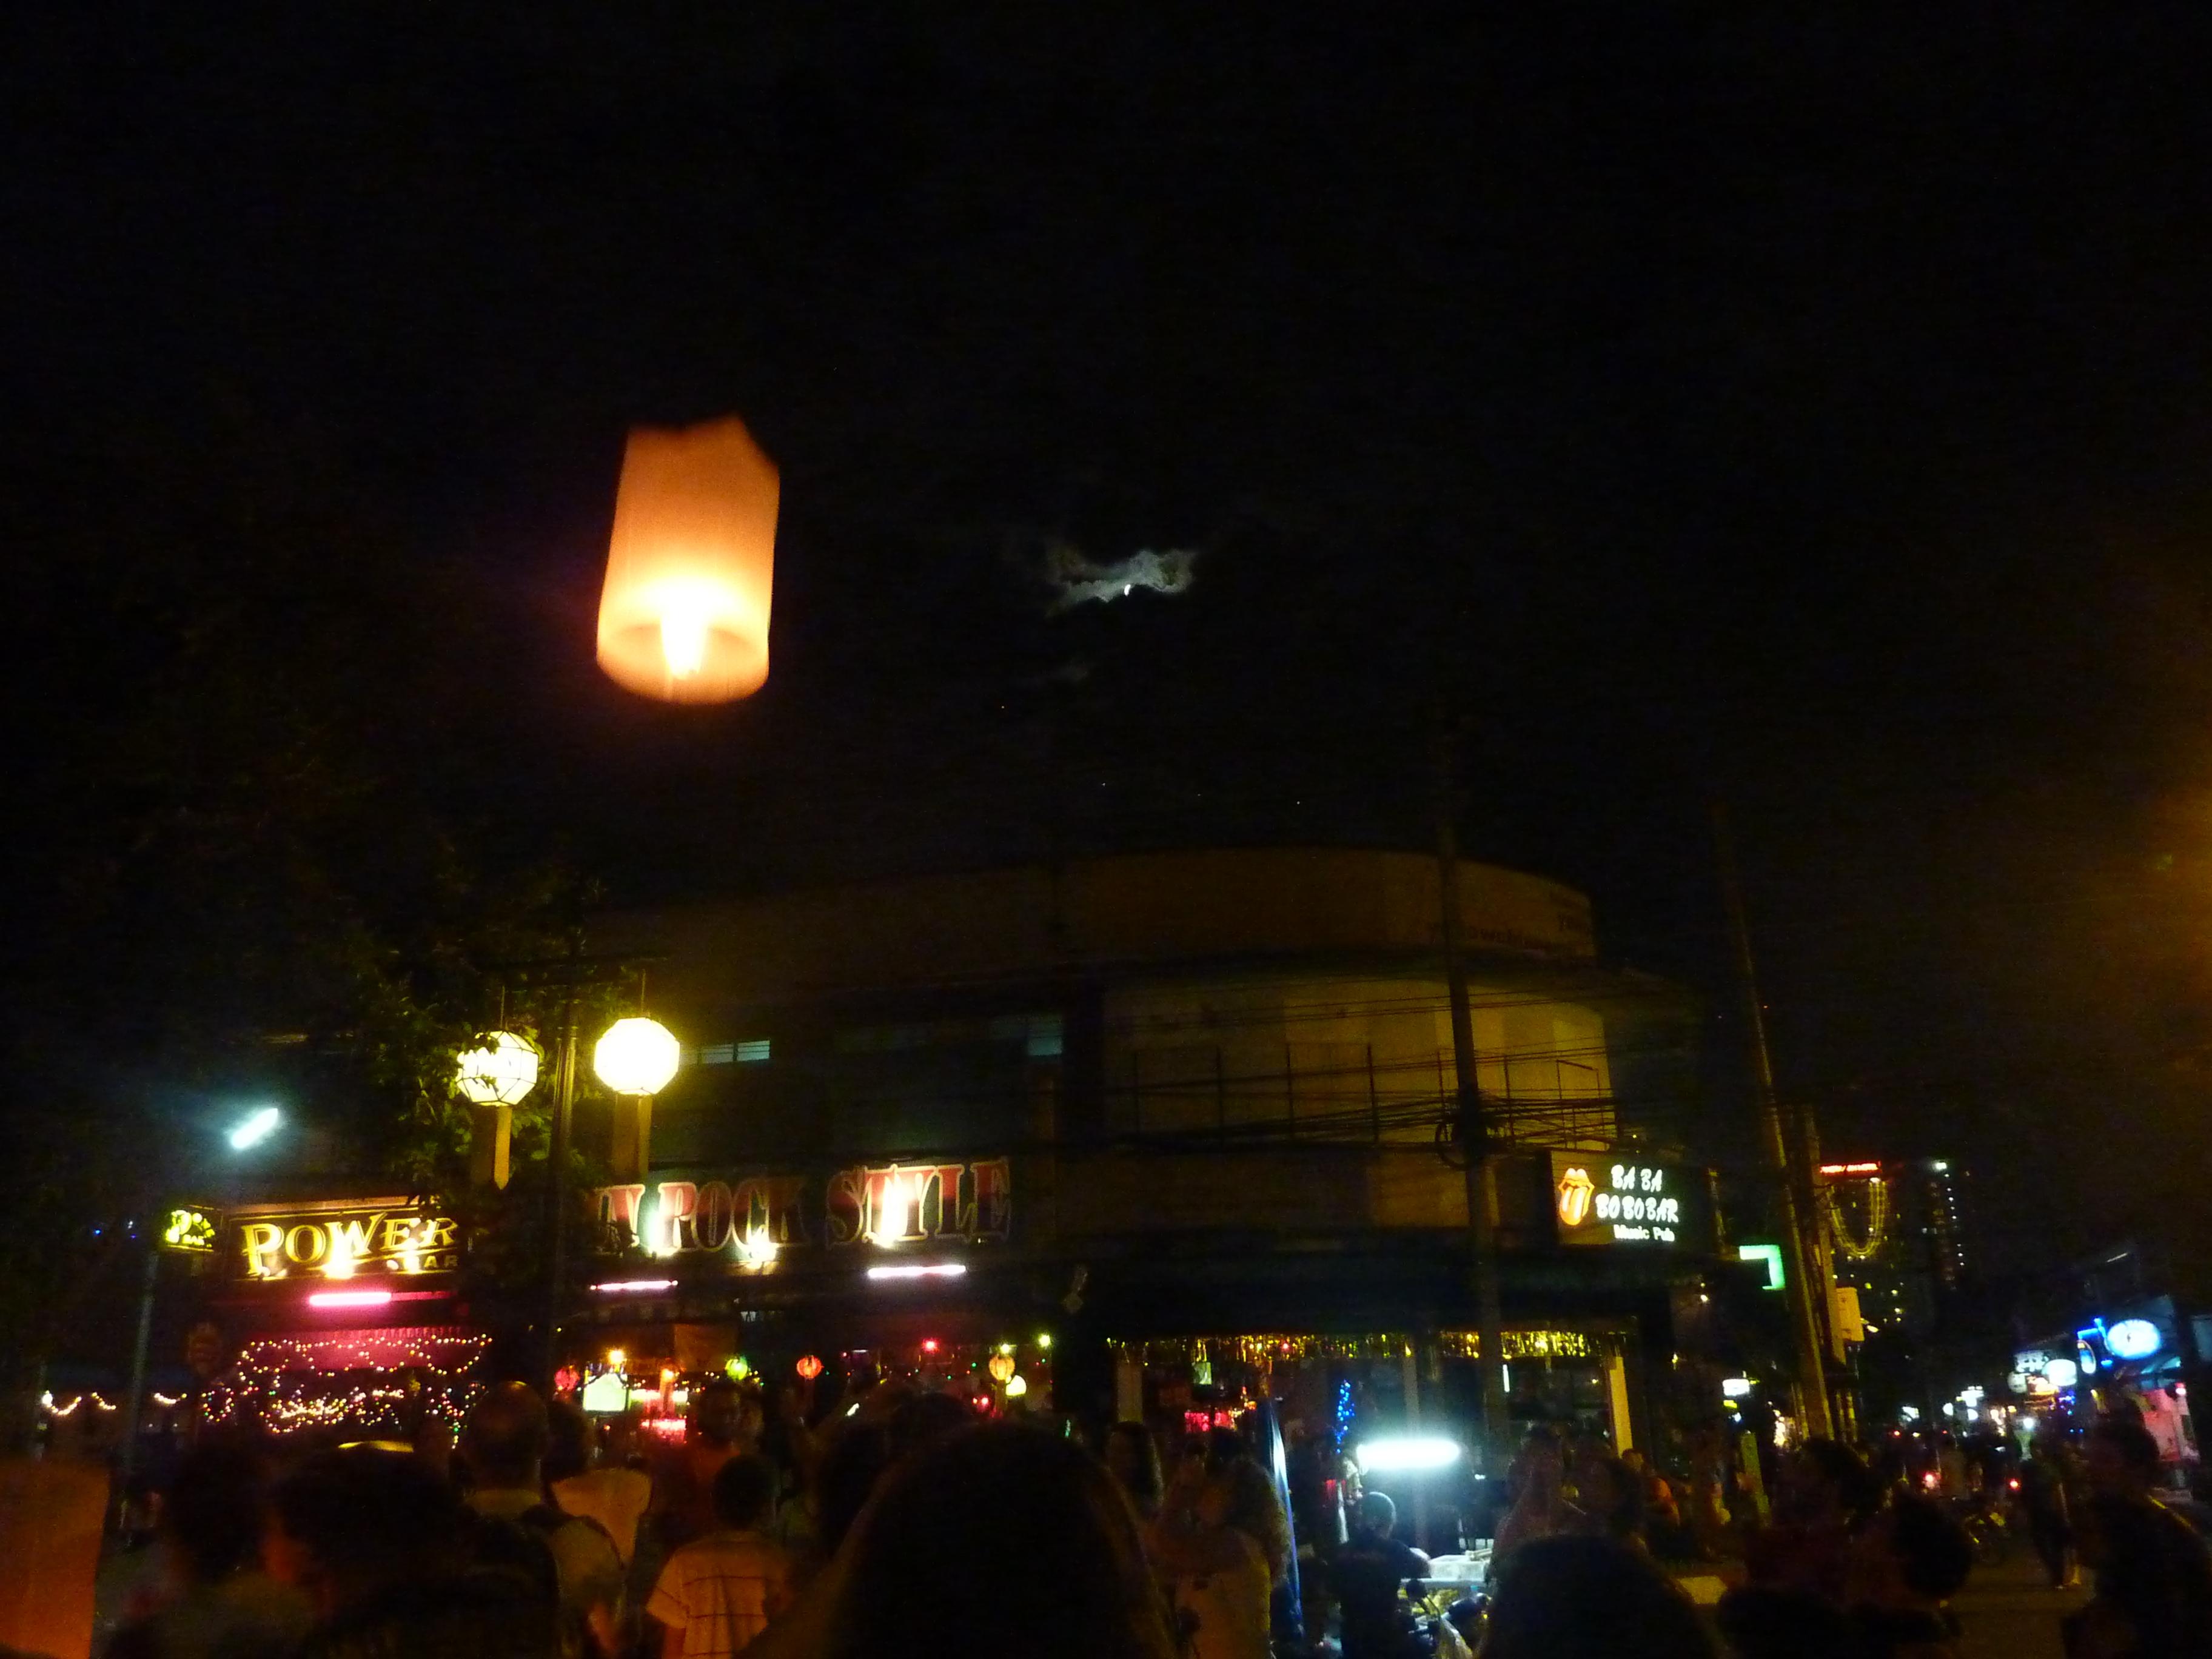 New Year's Lantern